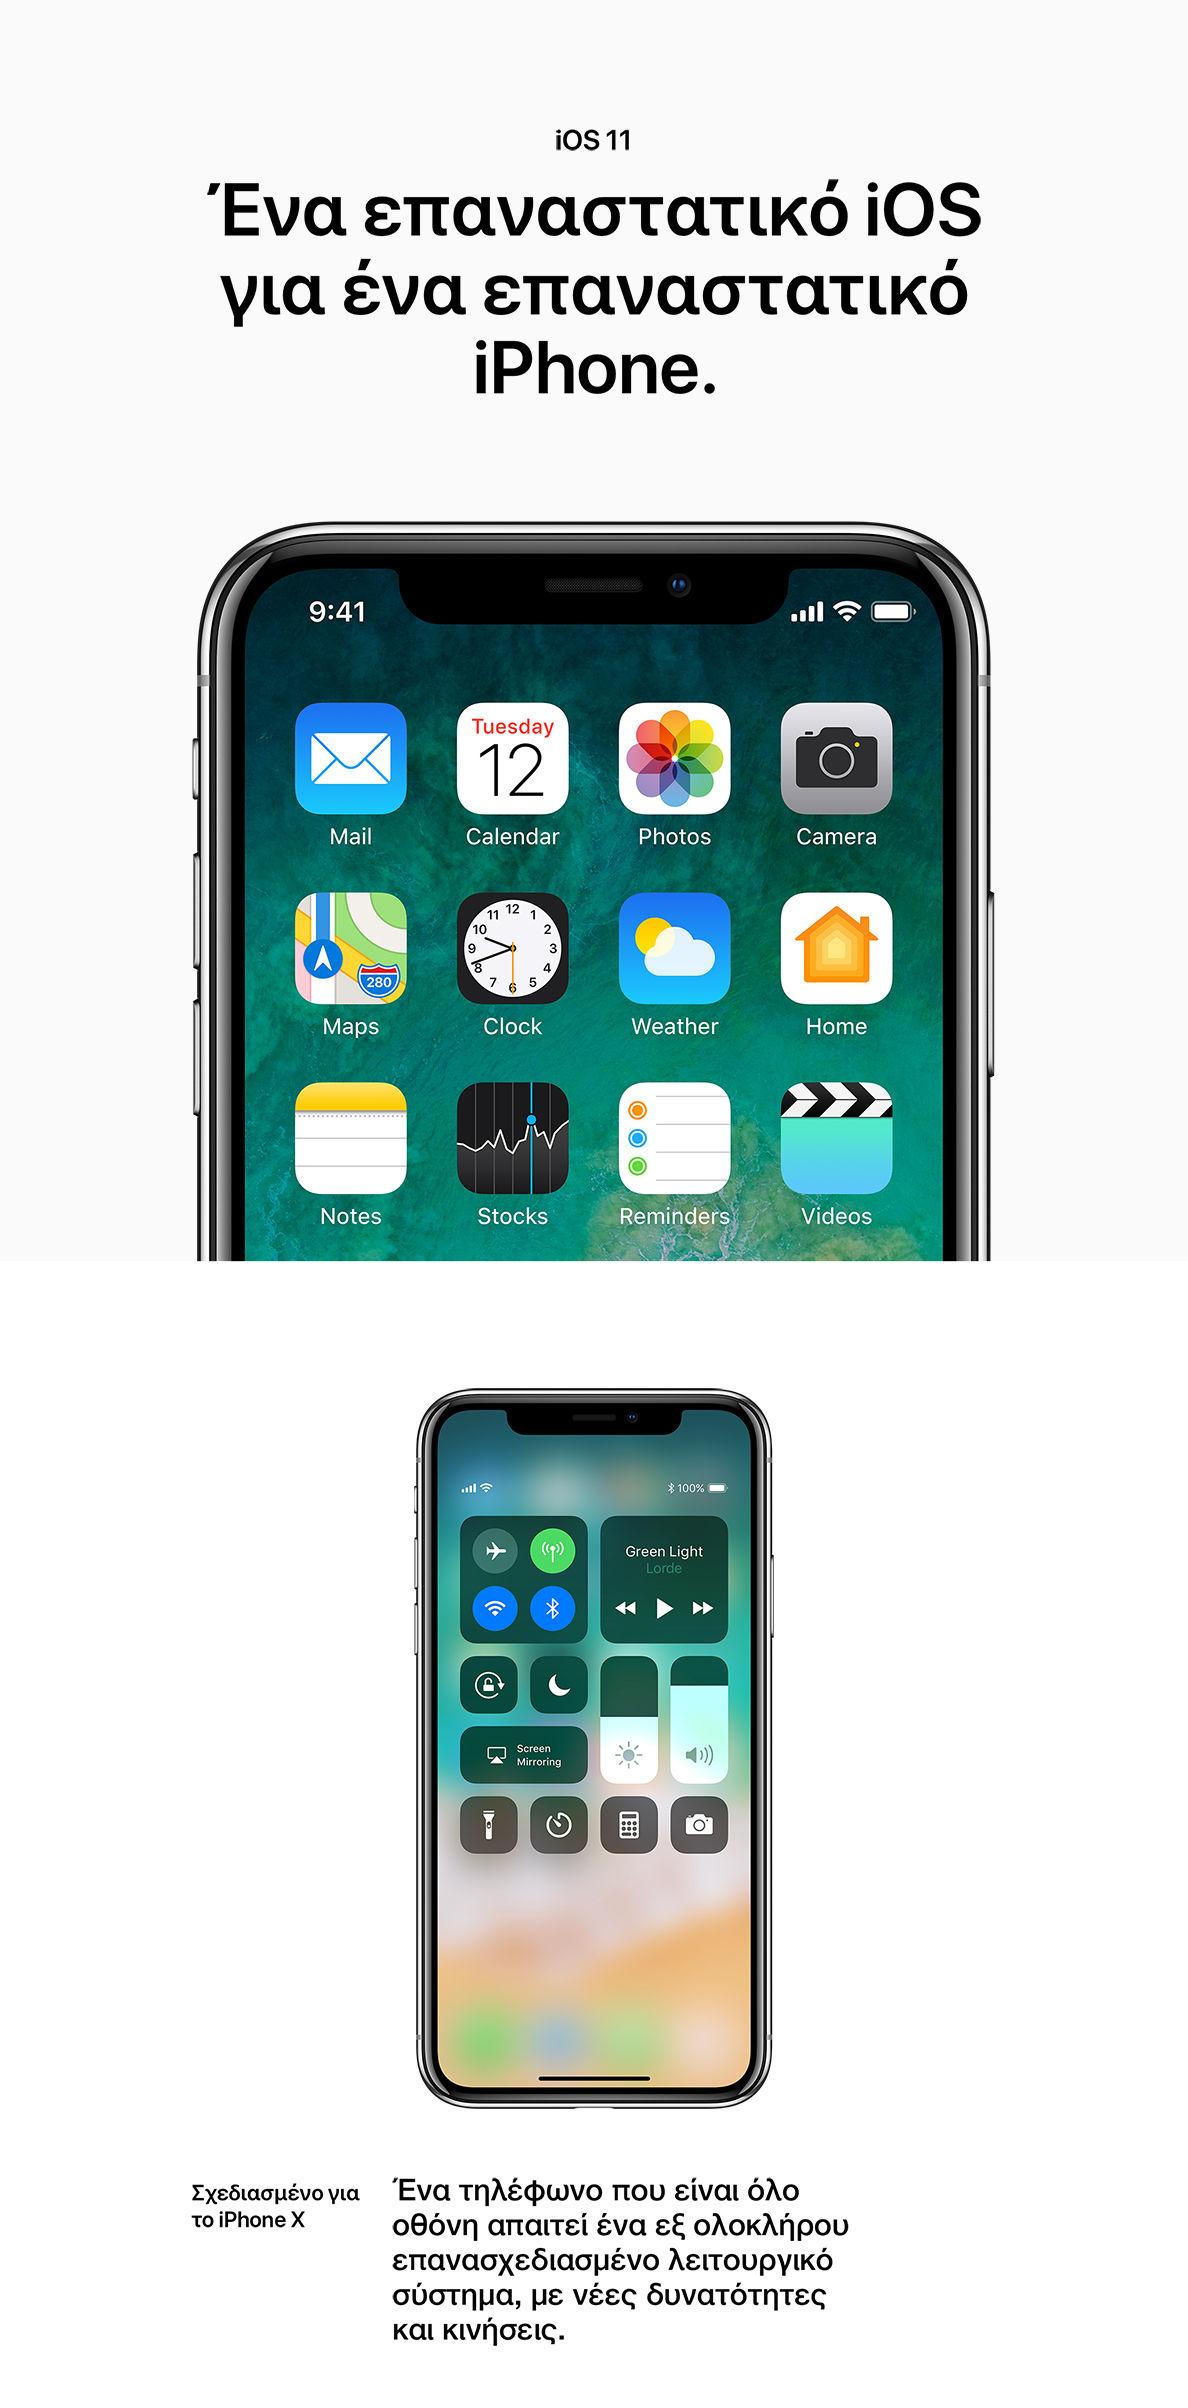 iPhonex-agora-Ellada-Mediamarkt-public-kotsovolos-germanos-iPhoneX-diathesimo-gia-paraggelia-november-2017 (14)